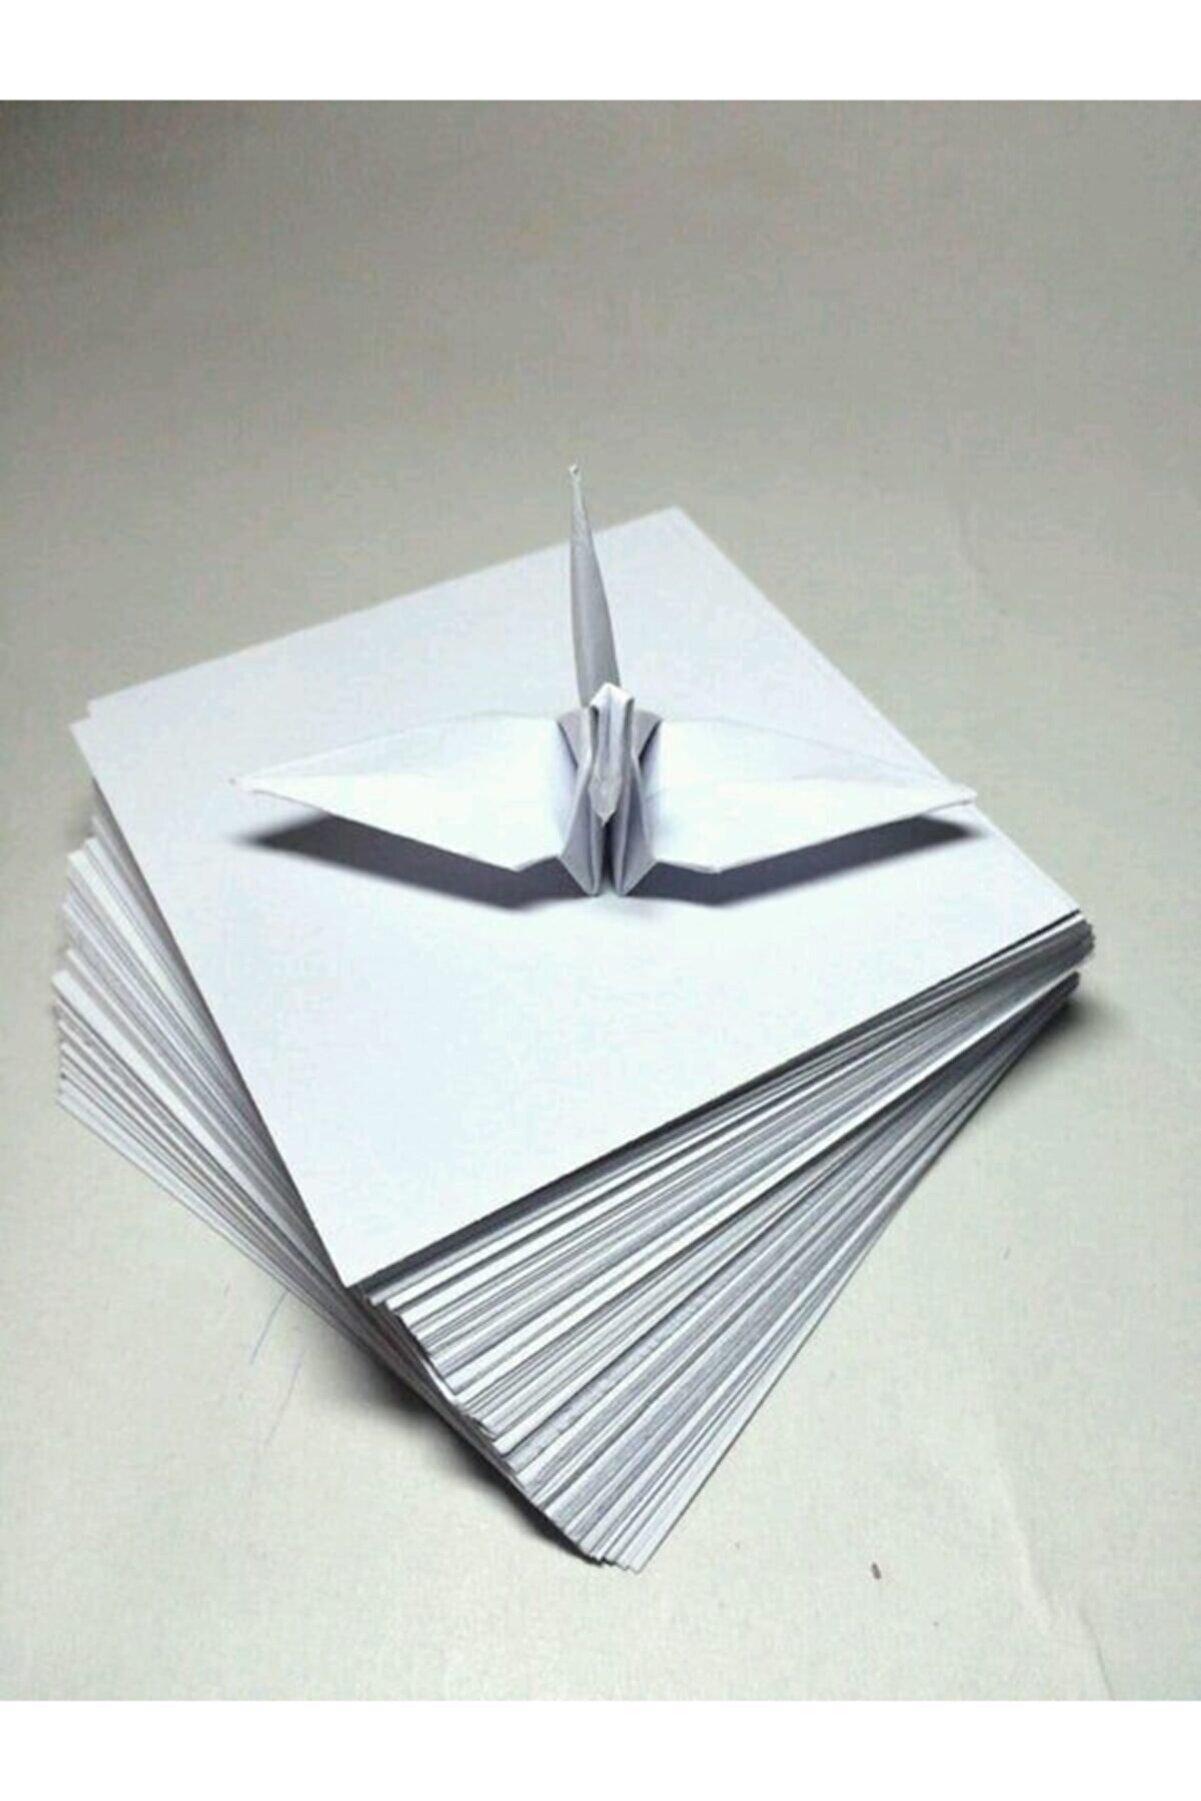 AKILLICA Origami Kağıt Seti Beyaz 100'lü Kağıt Katlama Oyunu 25x25 Cm